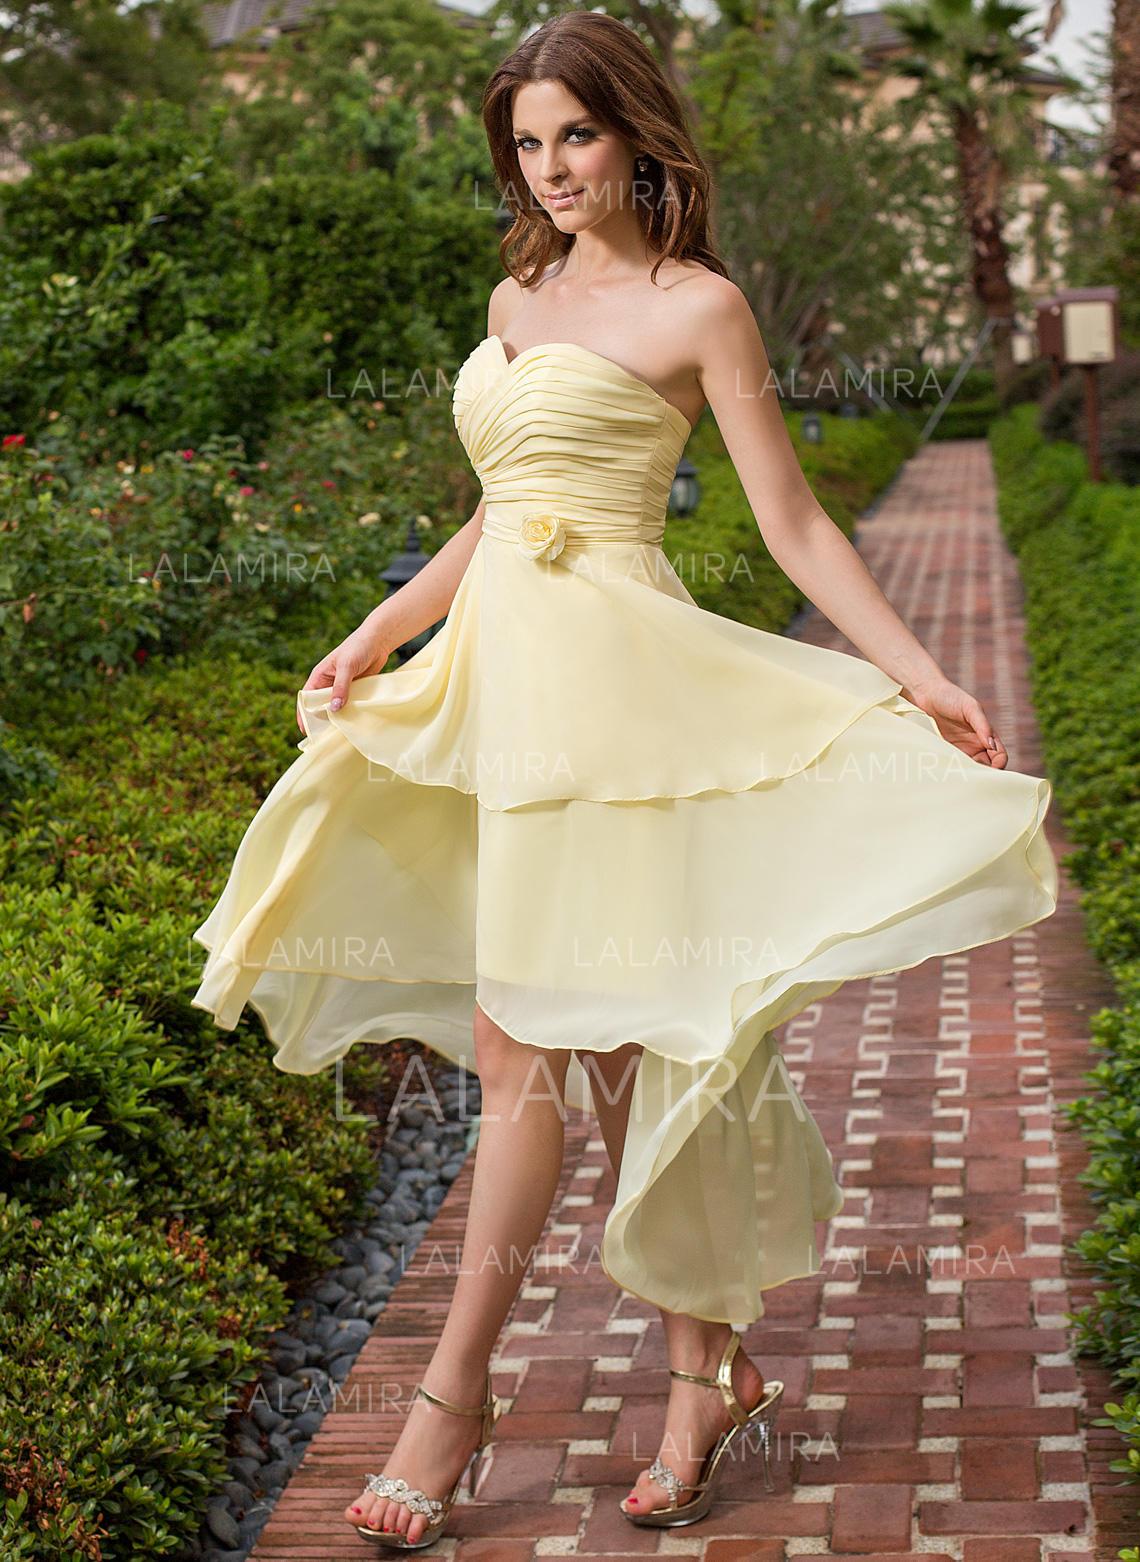 44ae9ae5803b A-Line/Princess Chiffon Bridesmaid Dresses Ruffle Flower(s) Sweetheart  Sleeveless Asymmetrical. Loading zoom